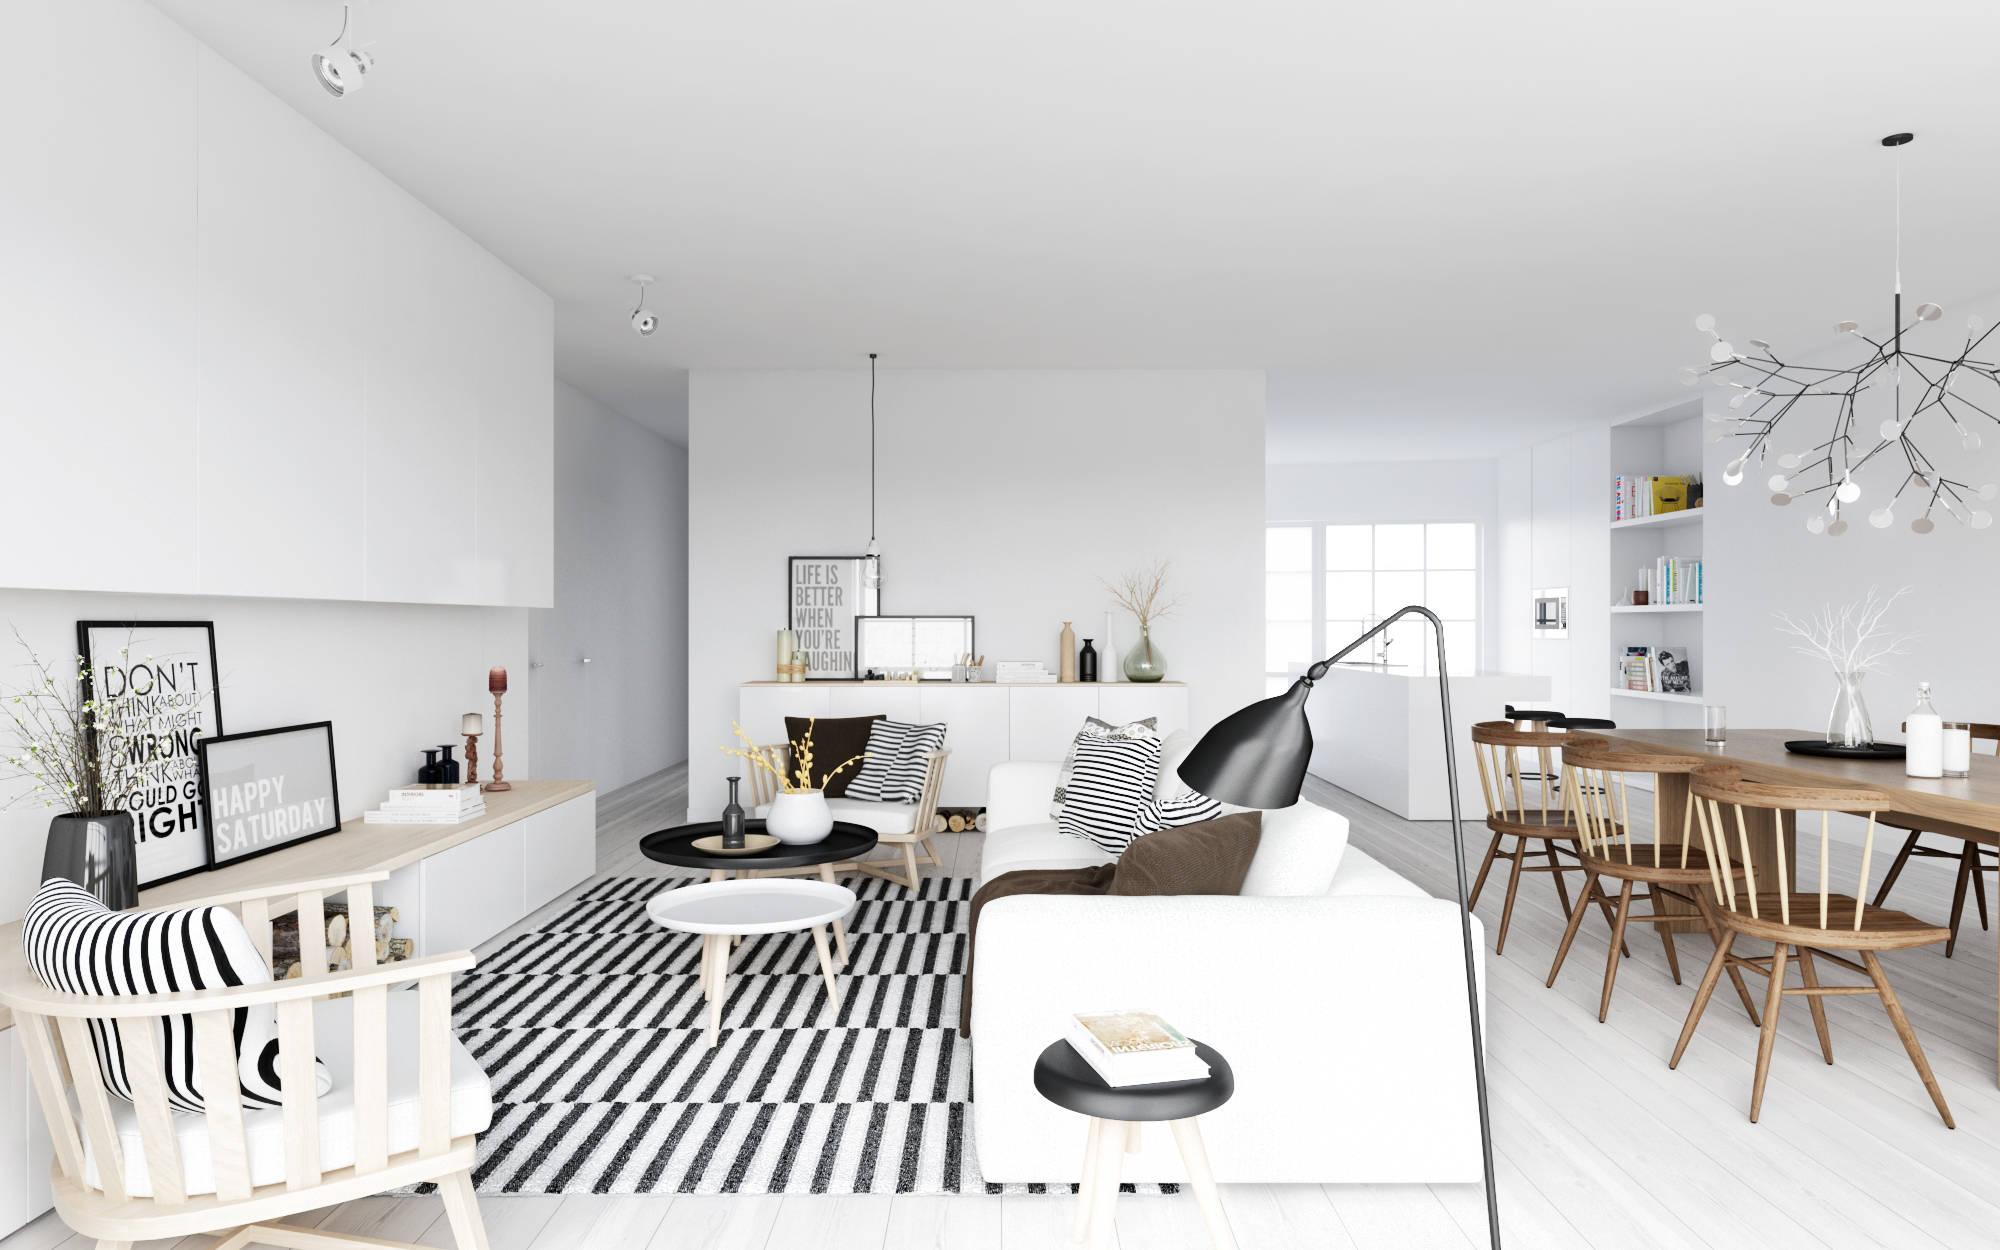 nordic interior design. Black Bedroom Furniture Sets. Home Design Ideas